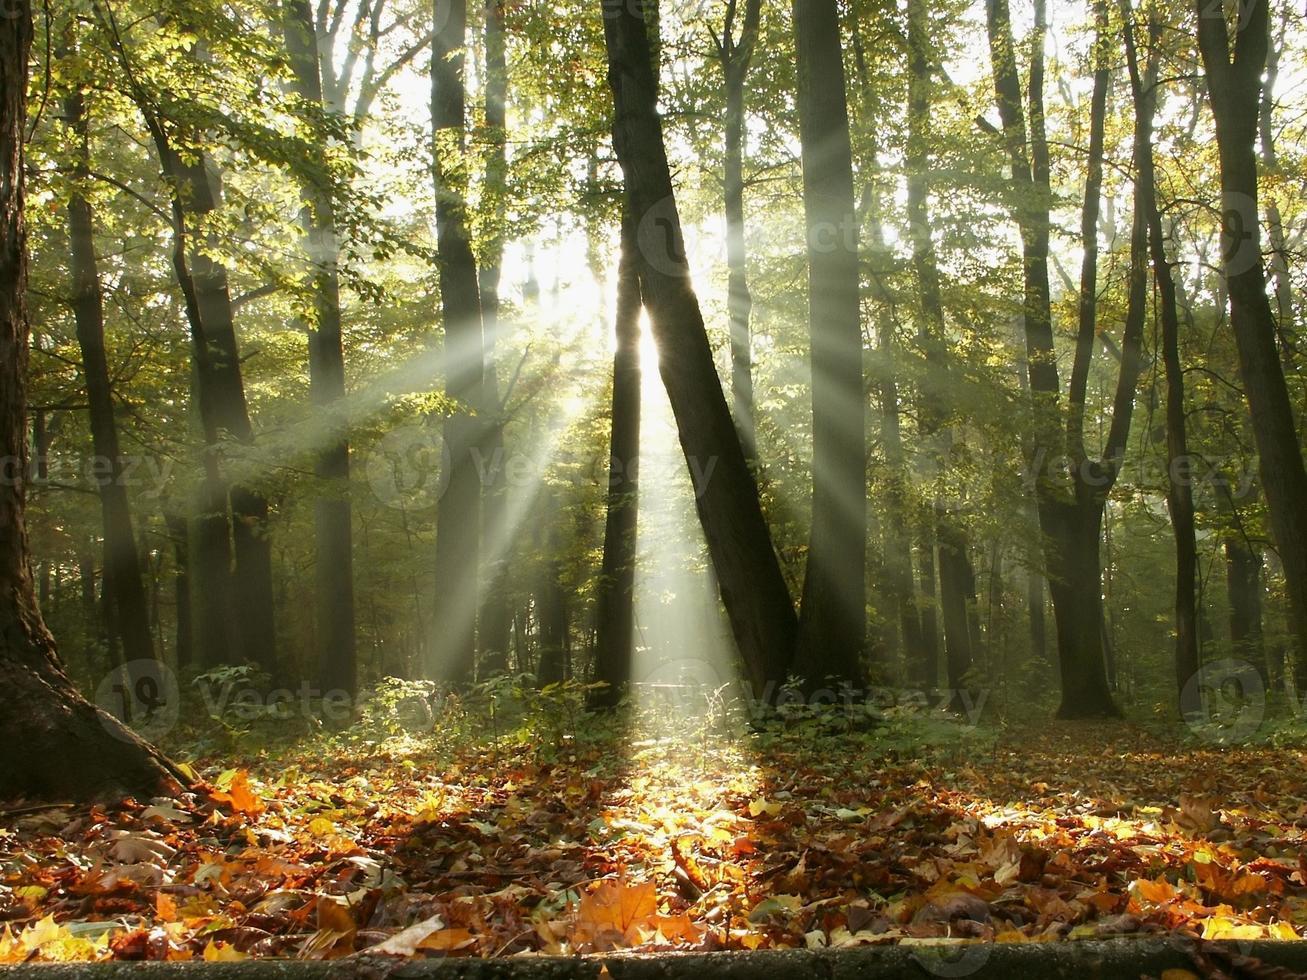 Misty autumn forest at sunrise photo